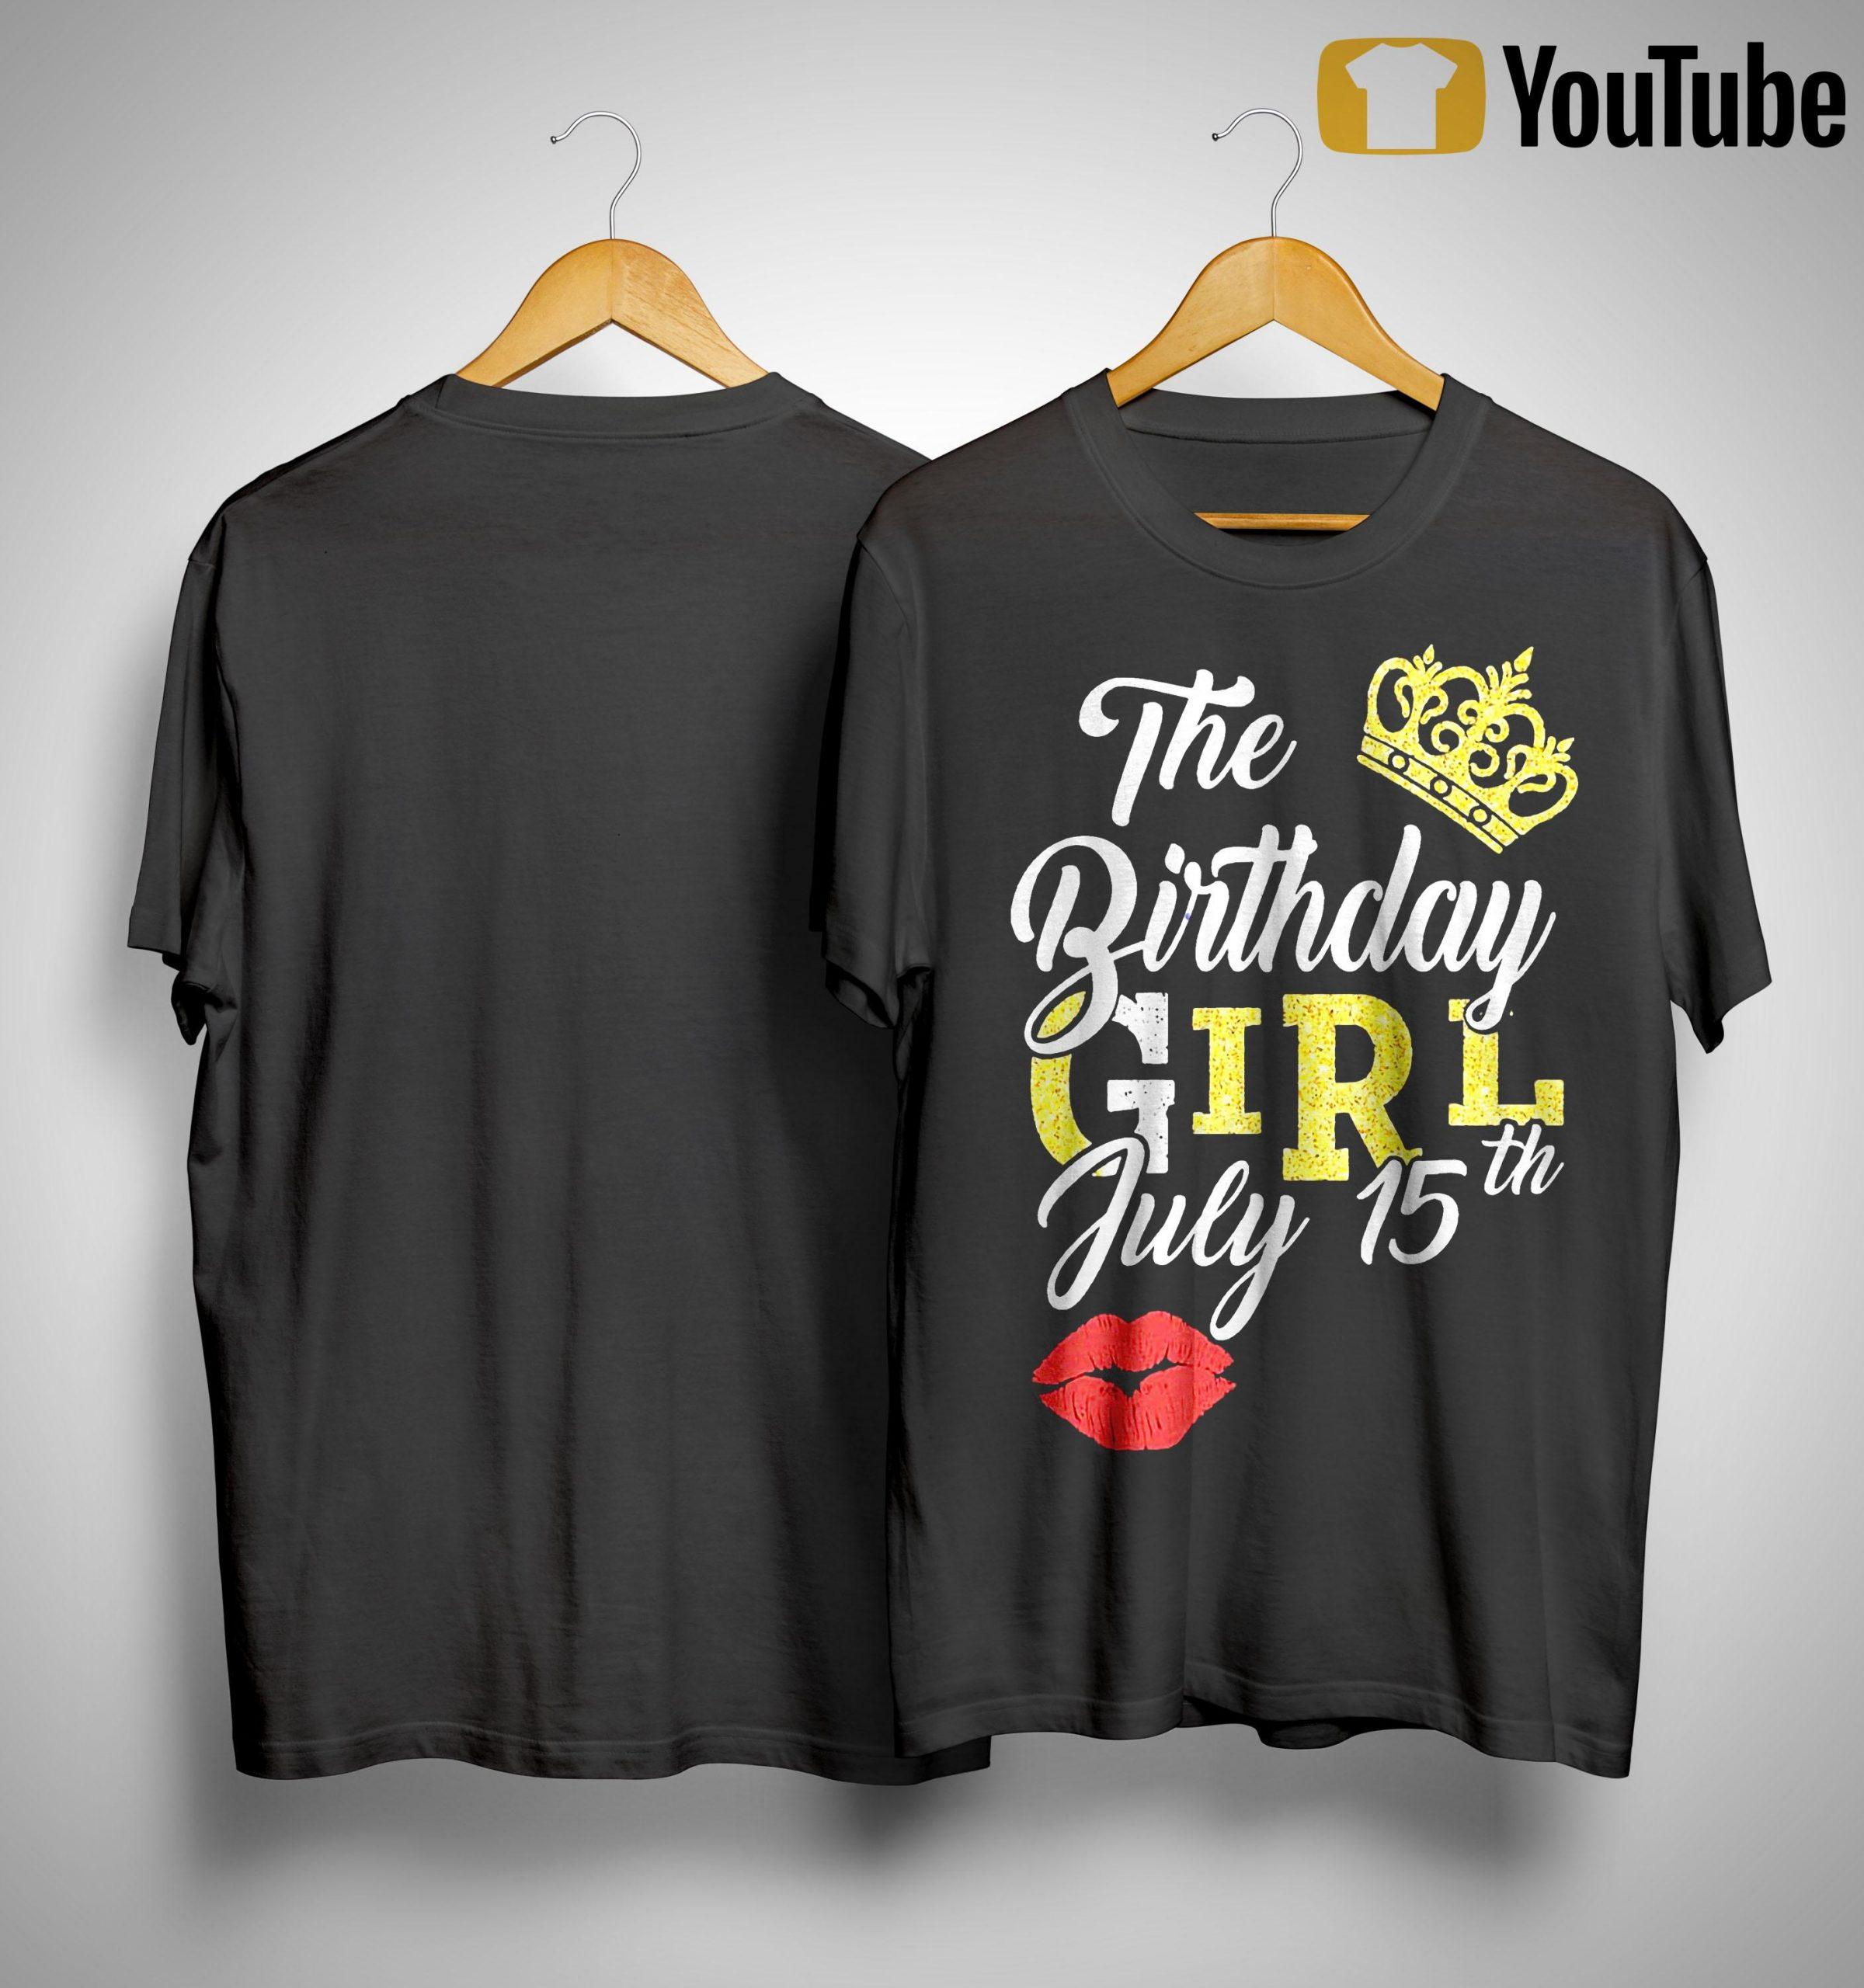 Queen Lip The Birthday Girl July 15th Shirt